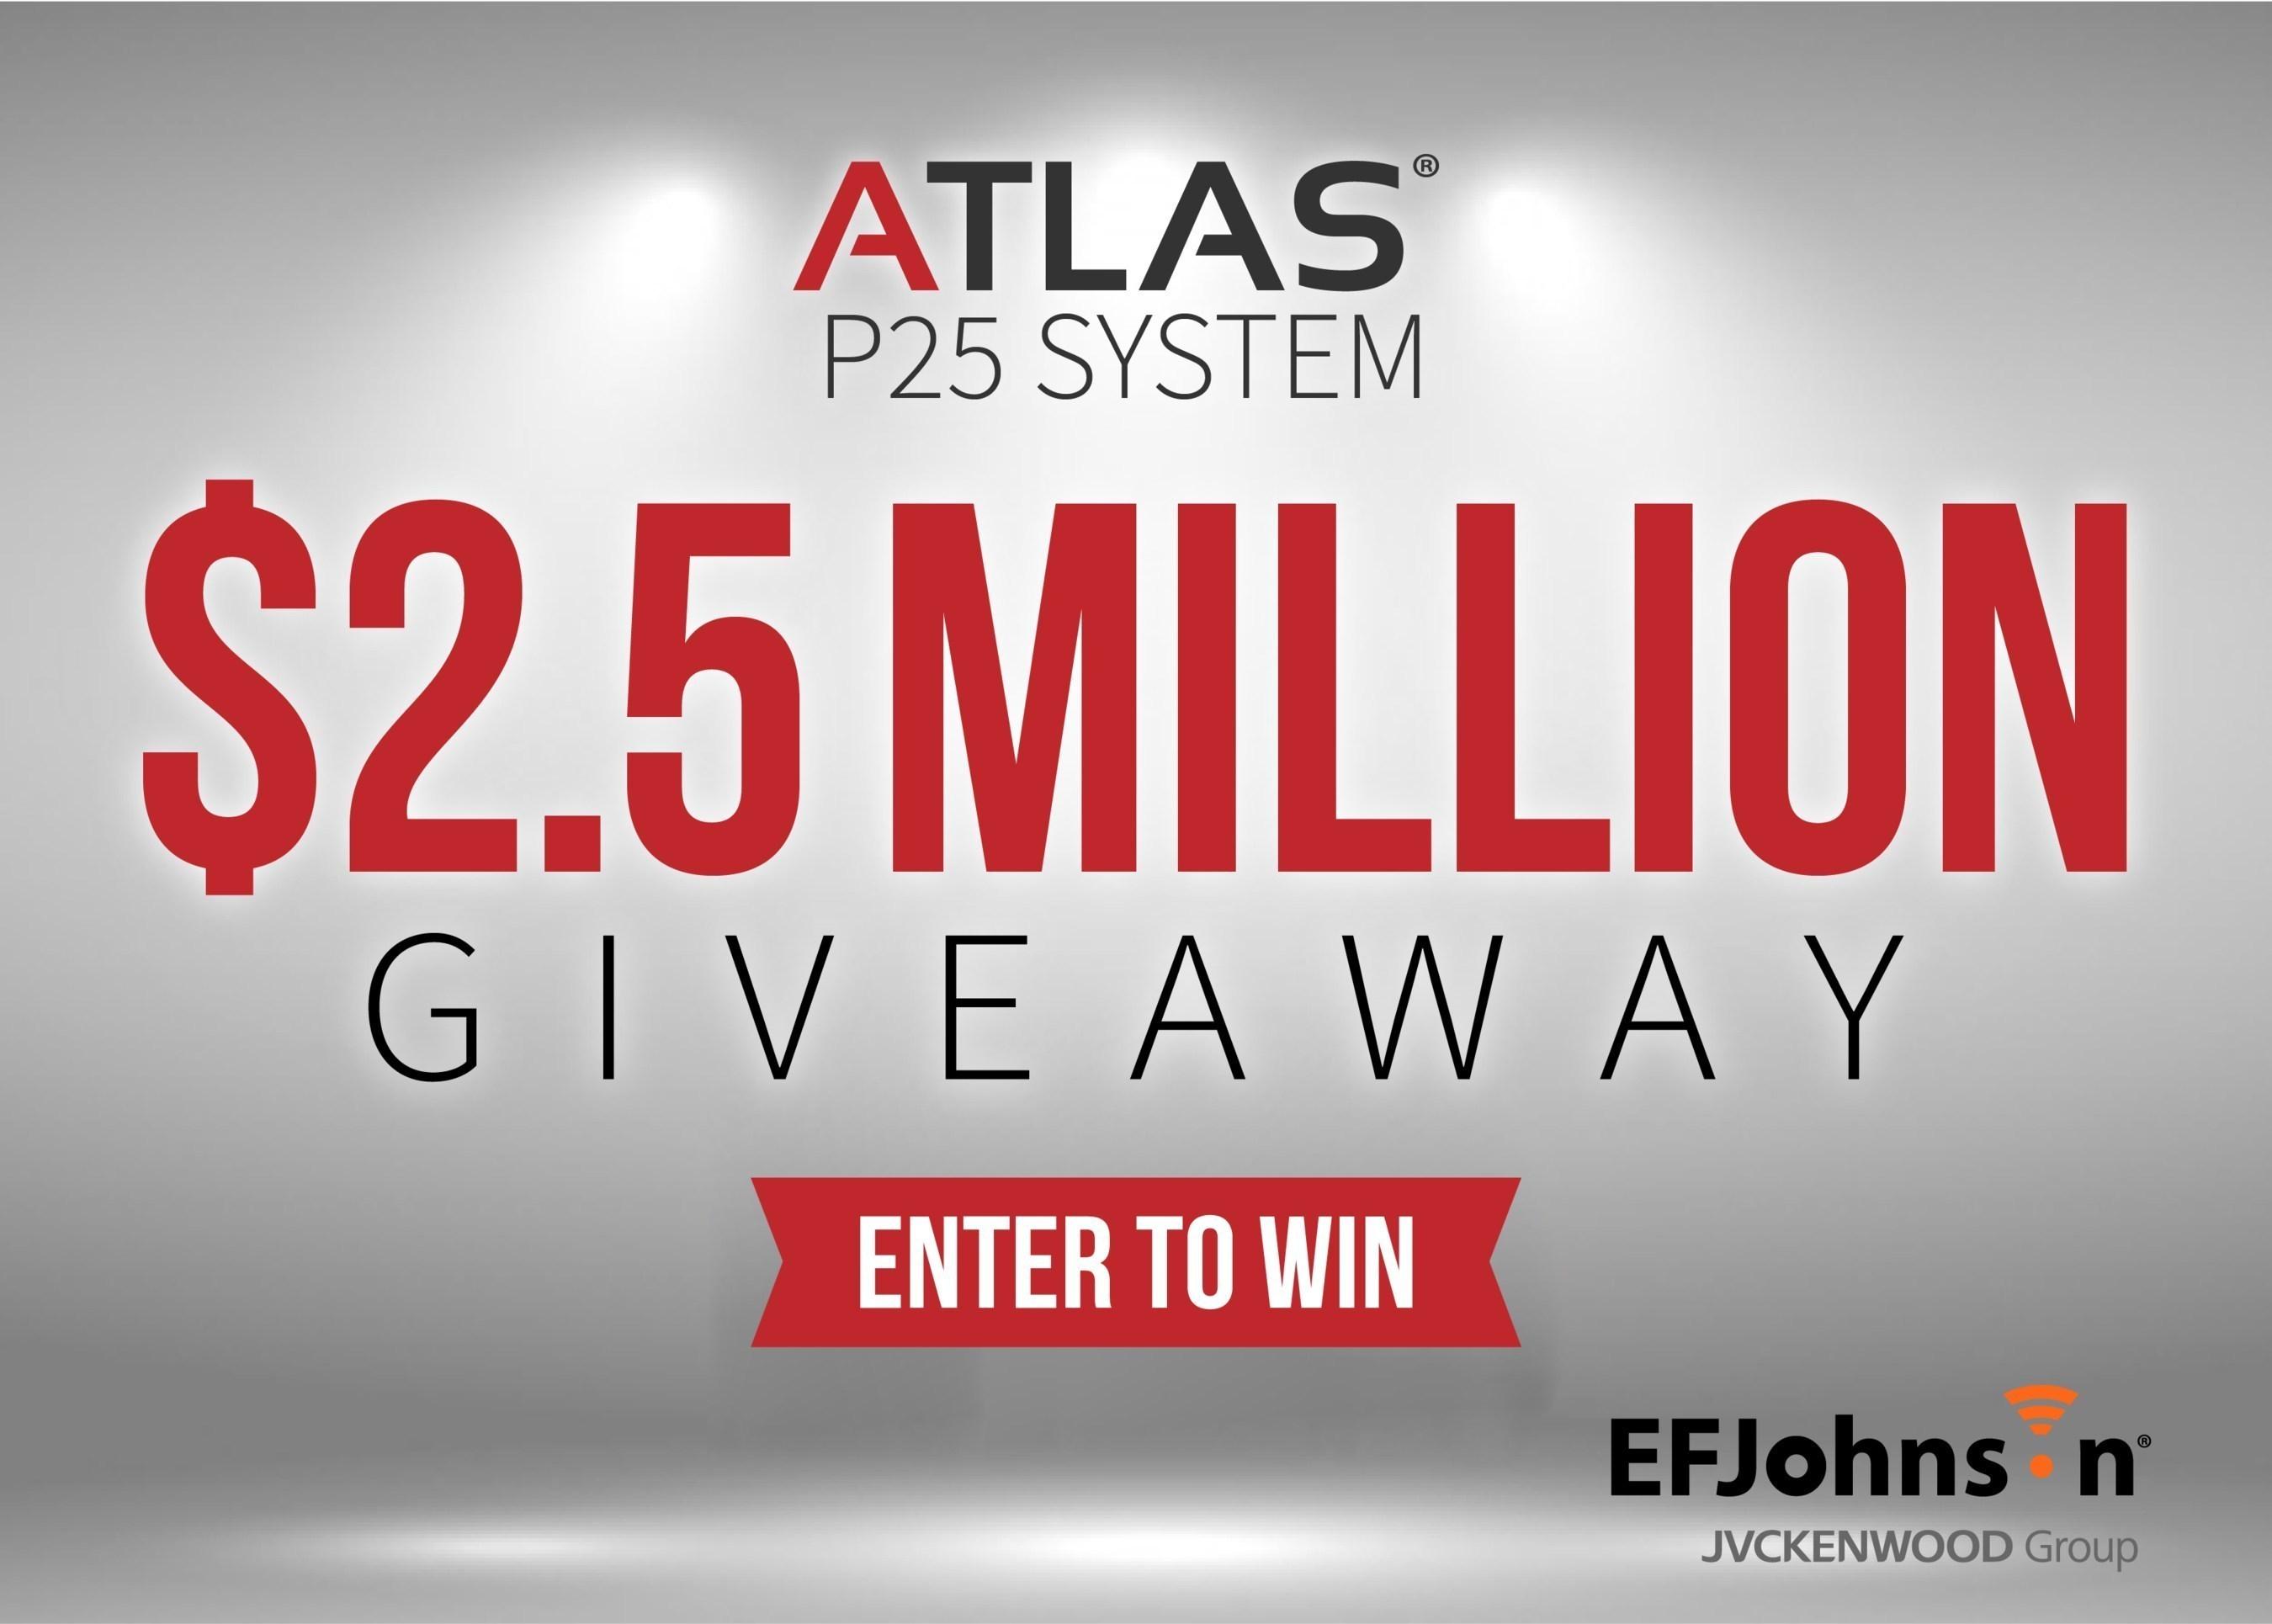 Enter EFJohnson's ATLAS P25 System $2.5M Giveaway